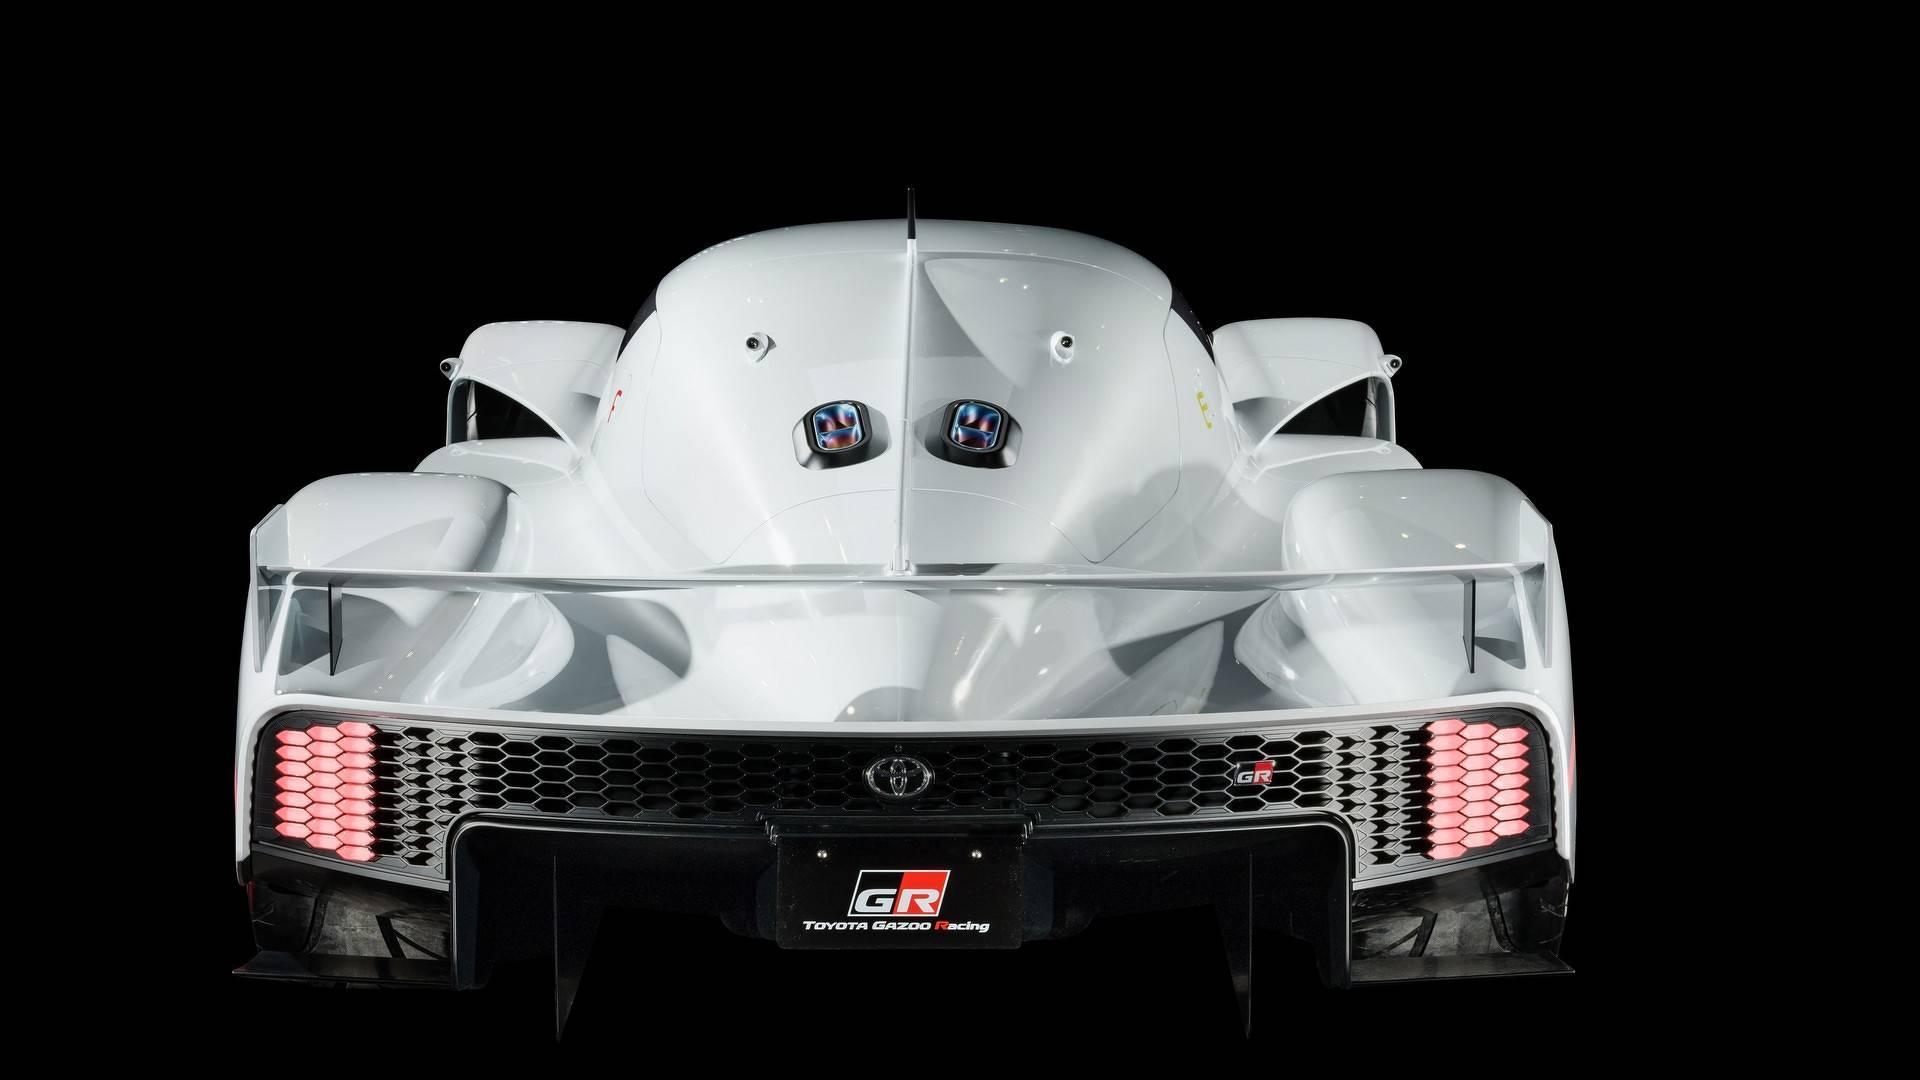 hypercars in de 24 uur van Le Mans